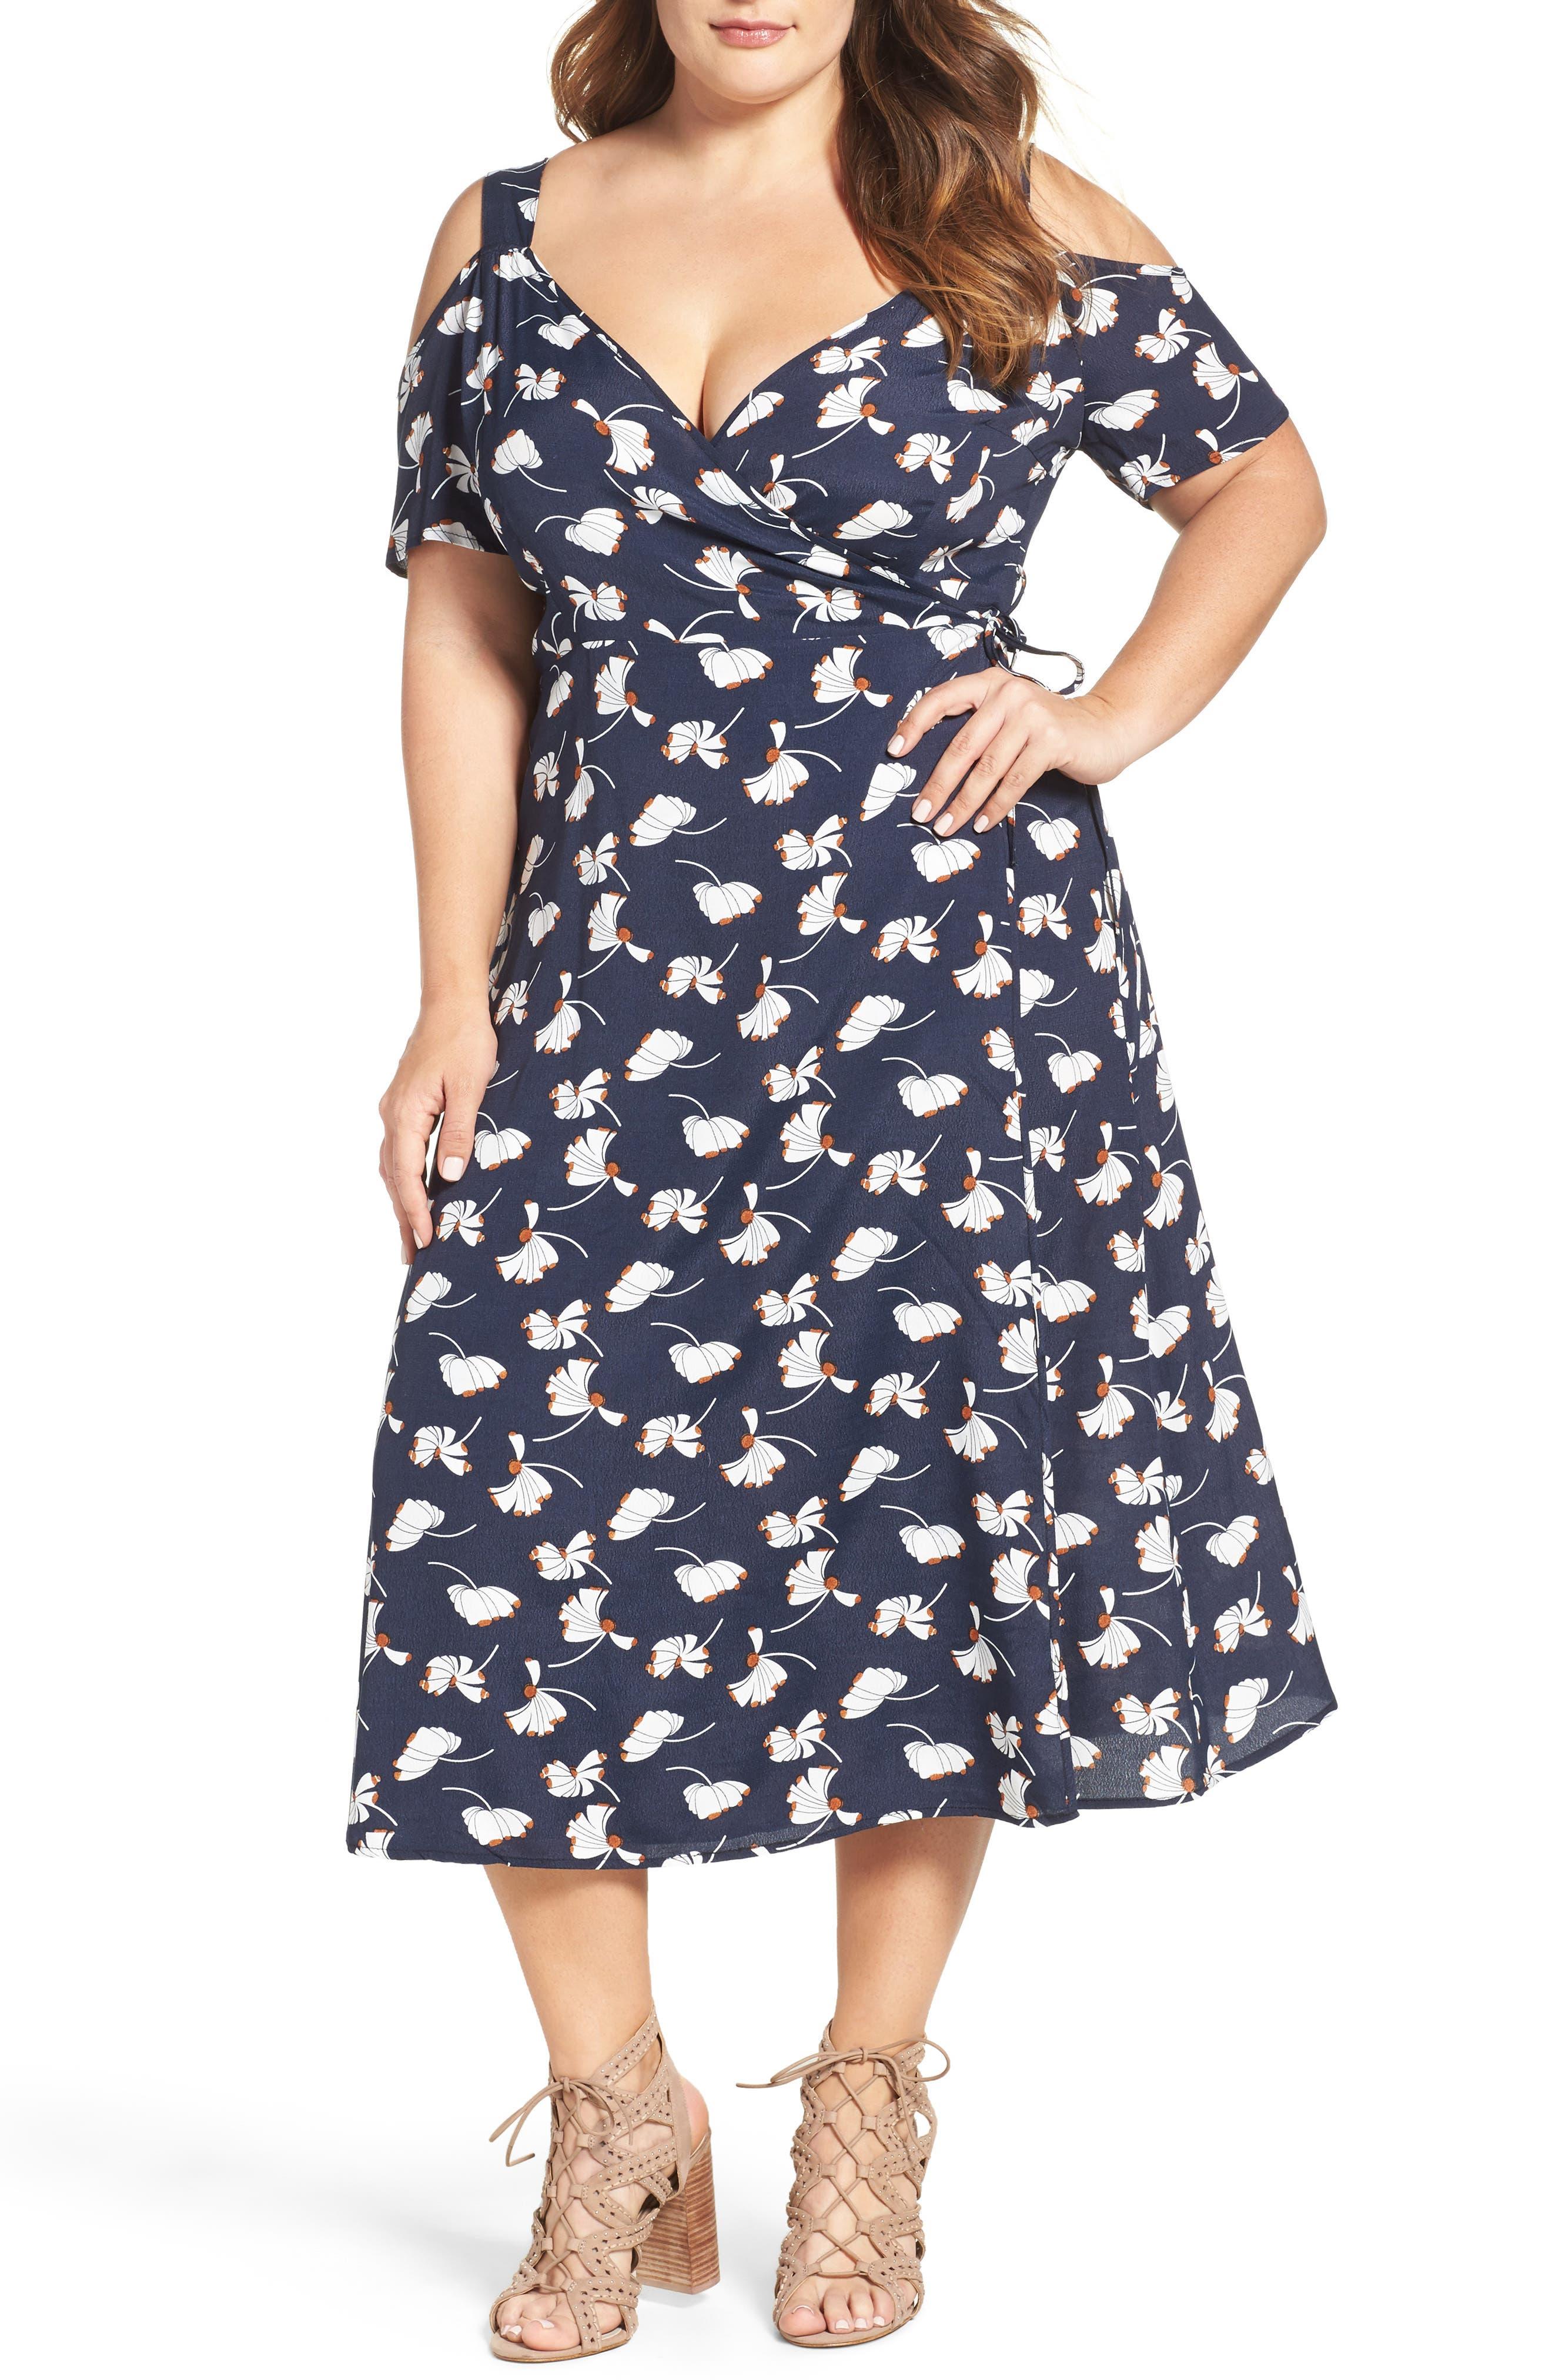 Alternate Image 1 Selected - Glamorous Cold Shoulder Wrap Dress (Plus Size)